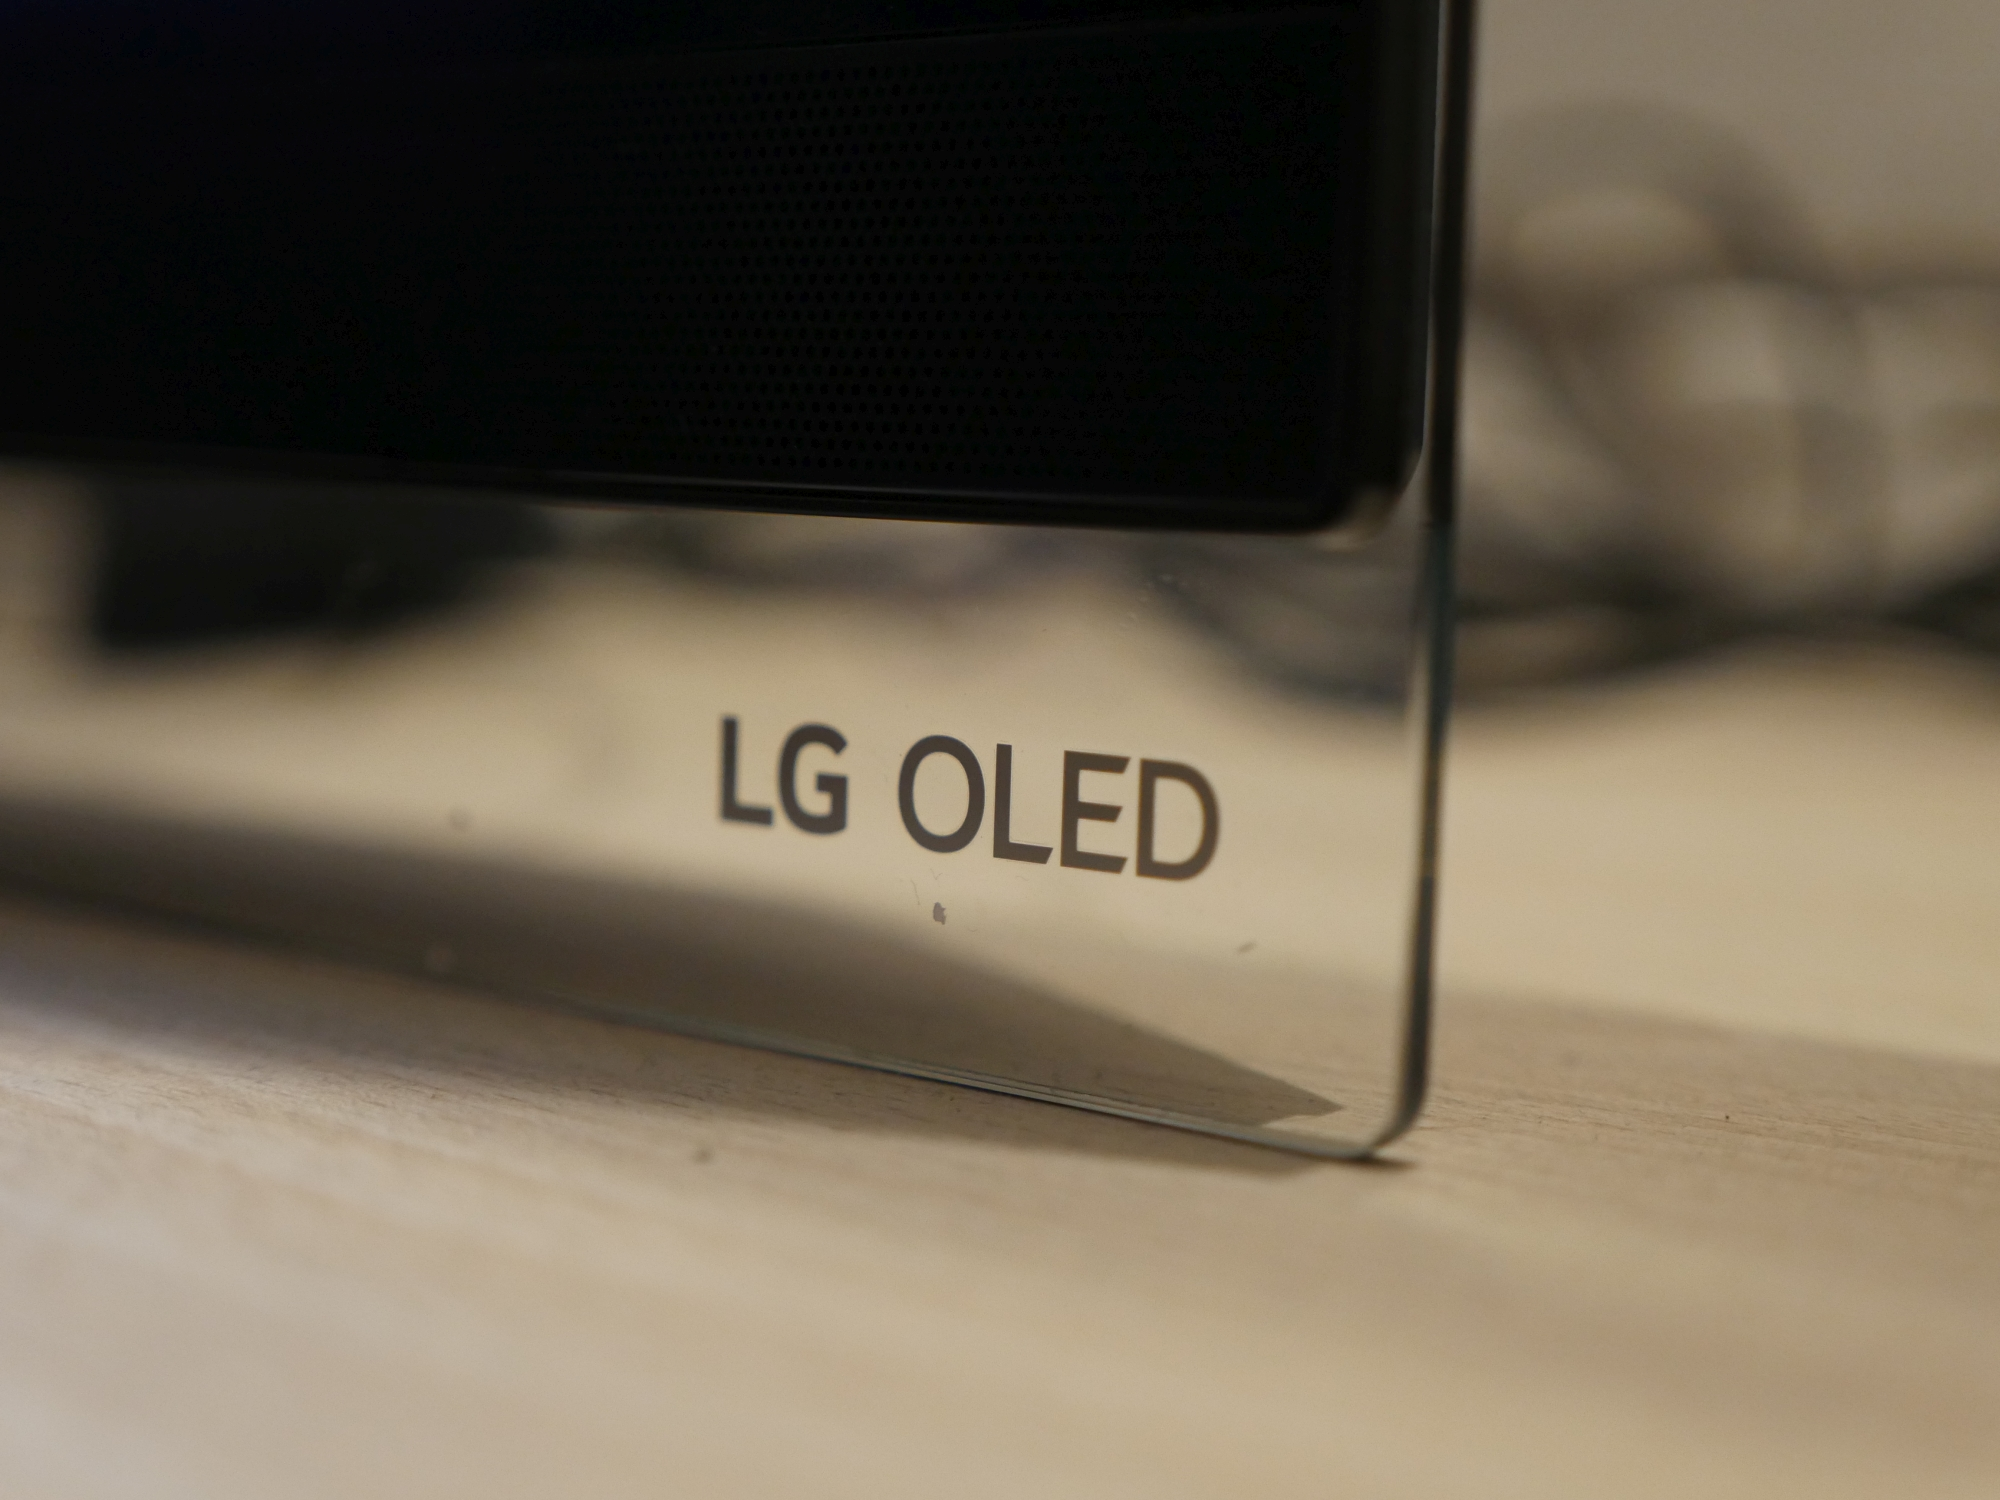 LG OLED E9 - recenzja szklanej wizji telewizji 25